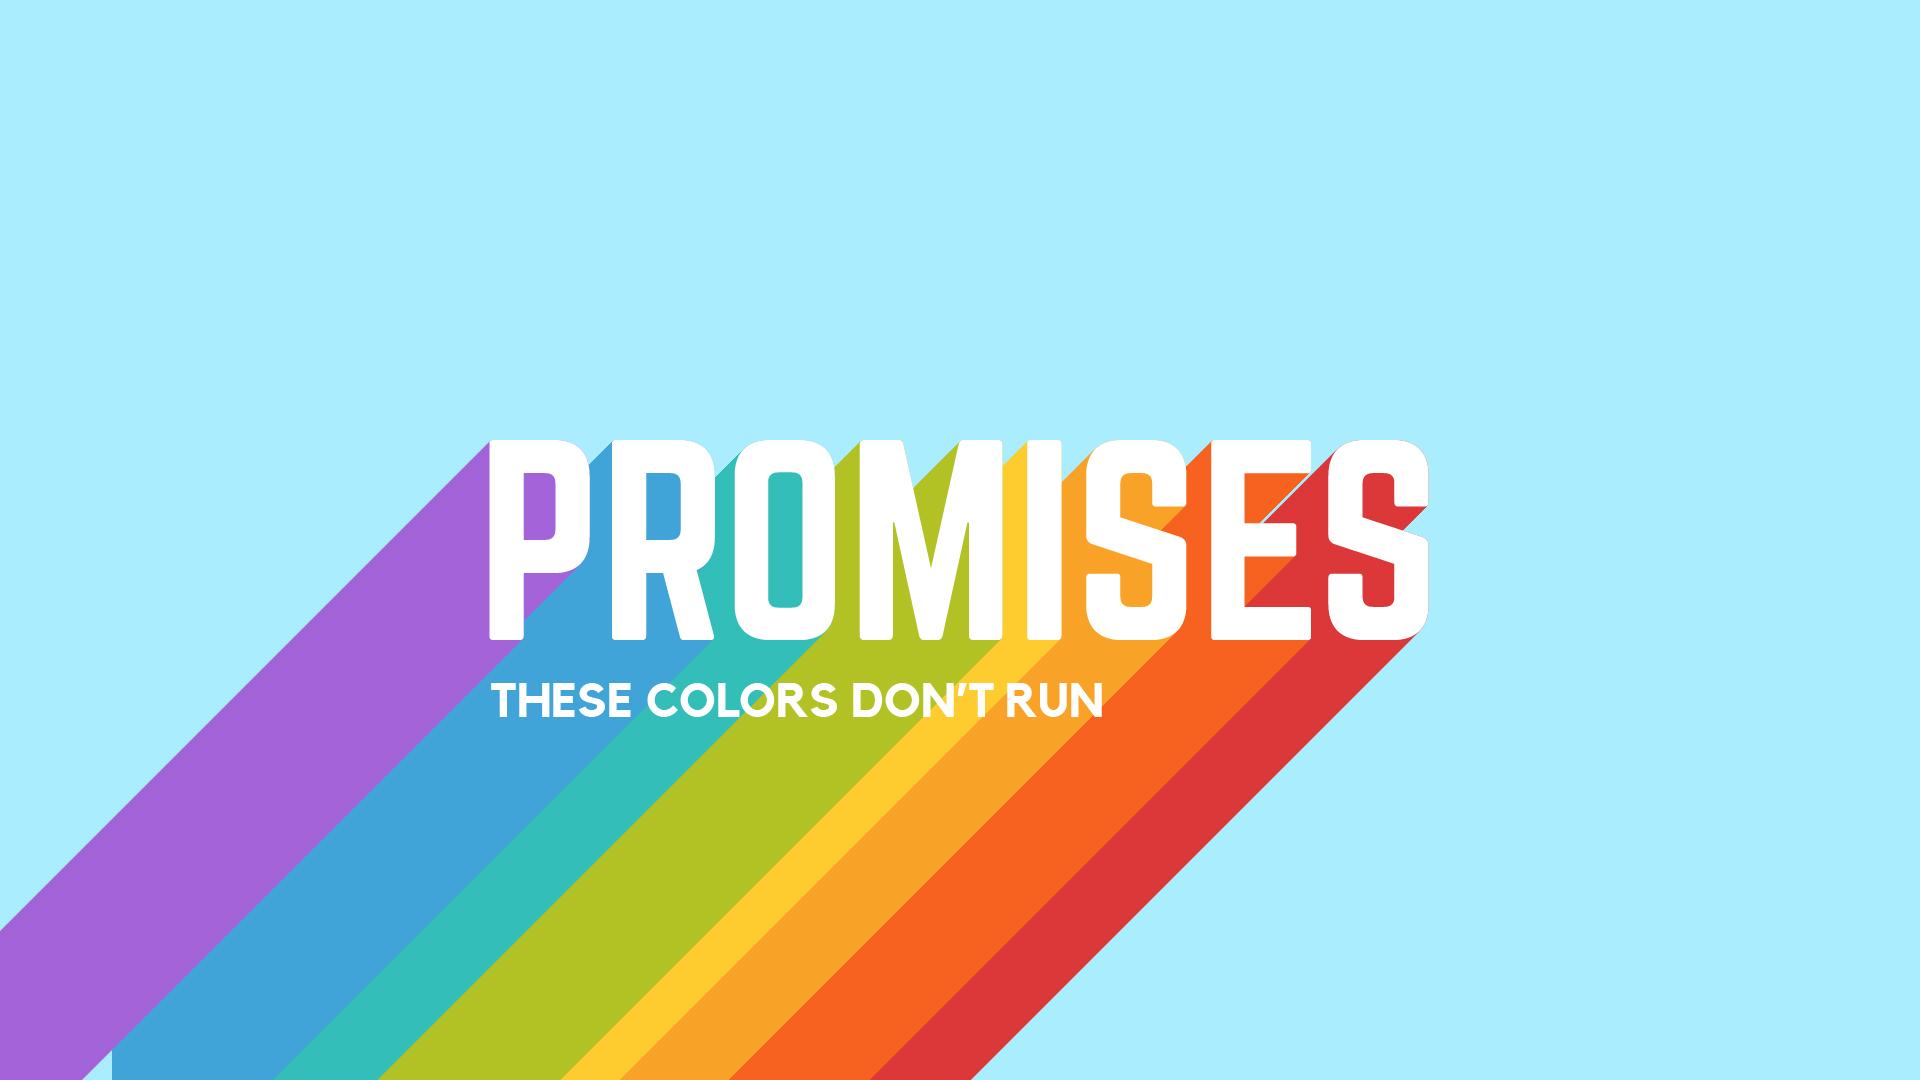 Promises Wk1 Title 1920x1080.jpg